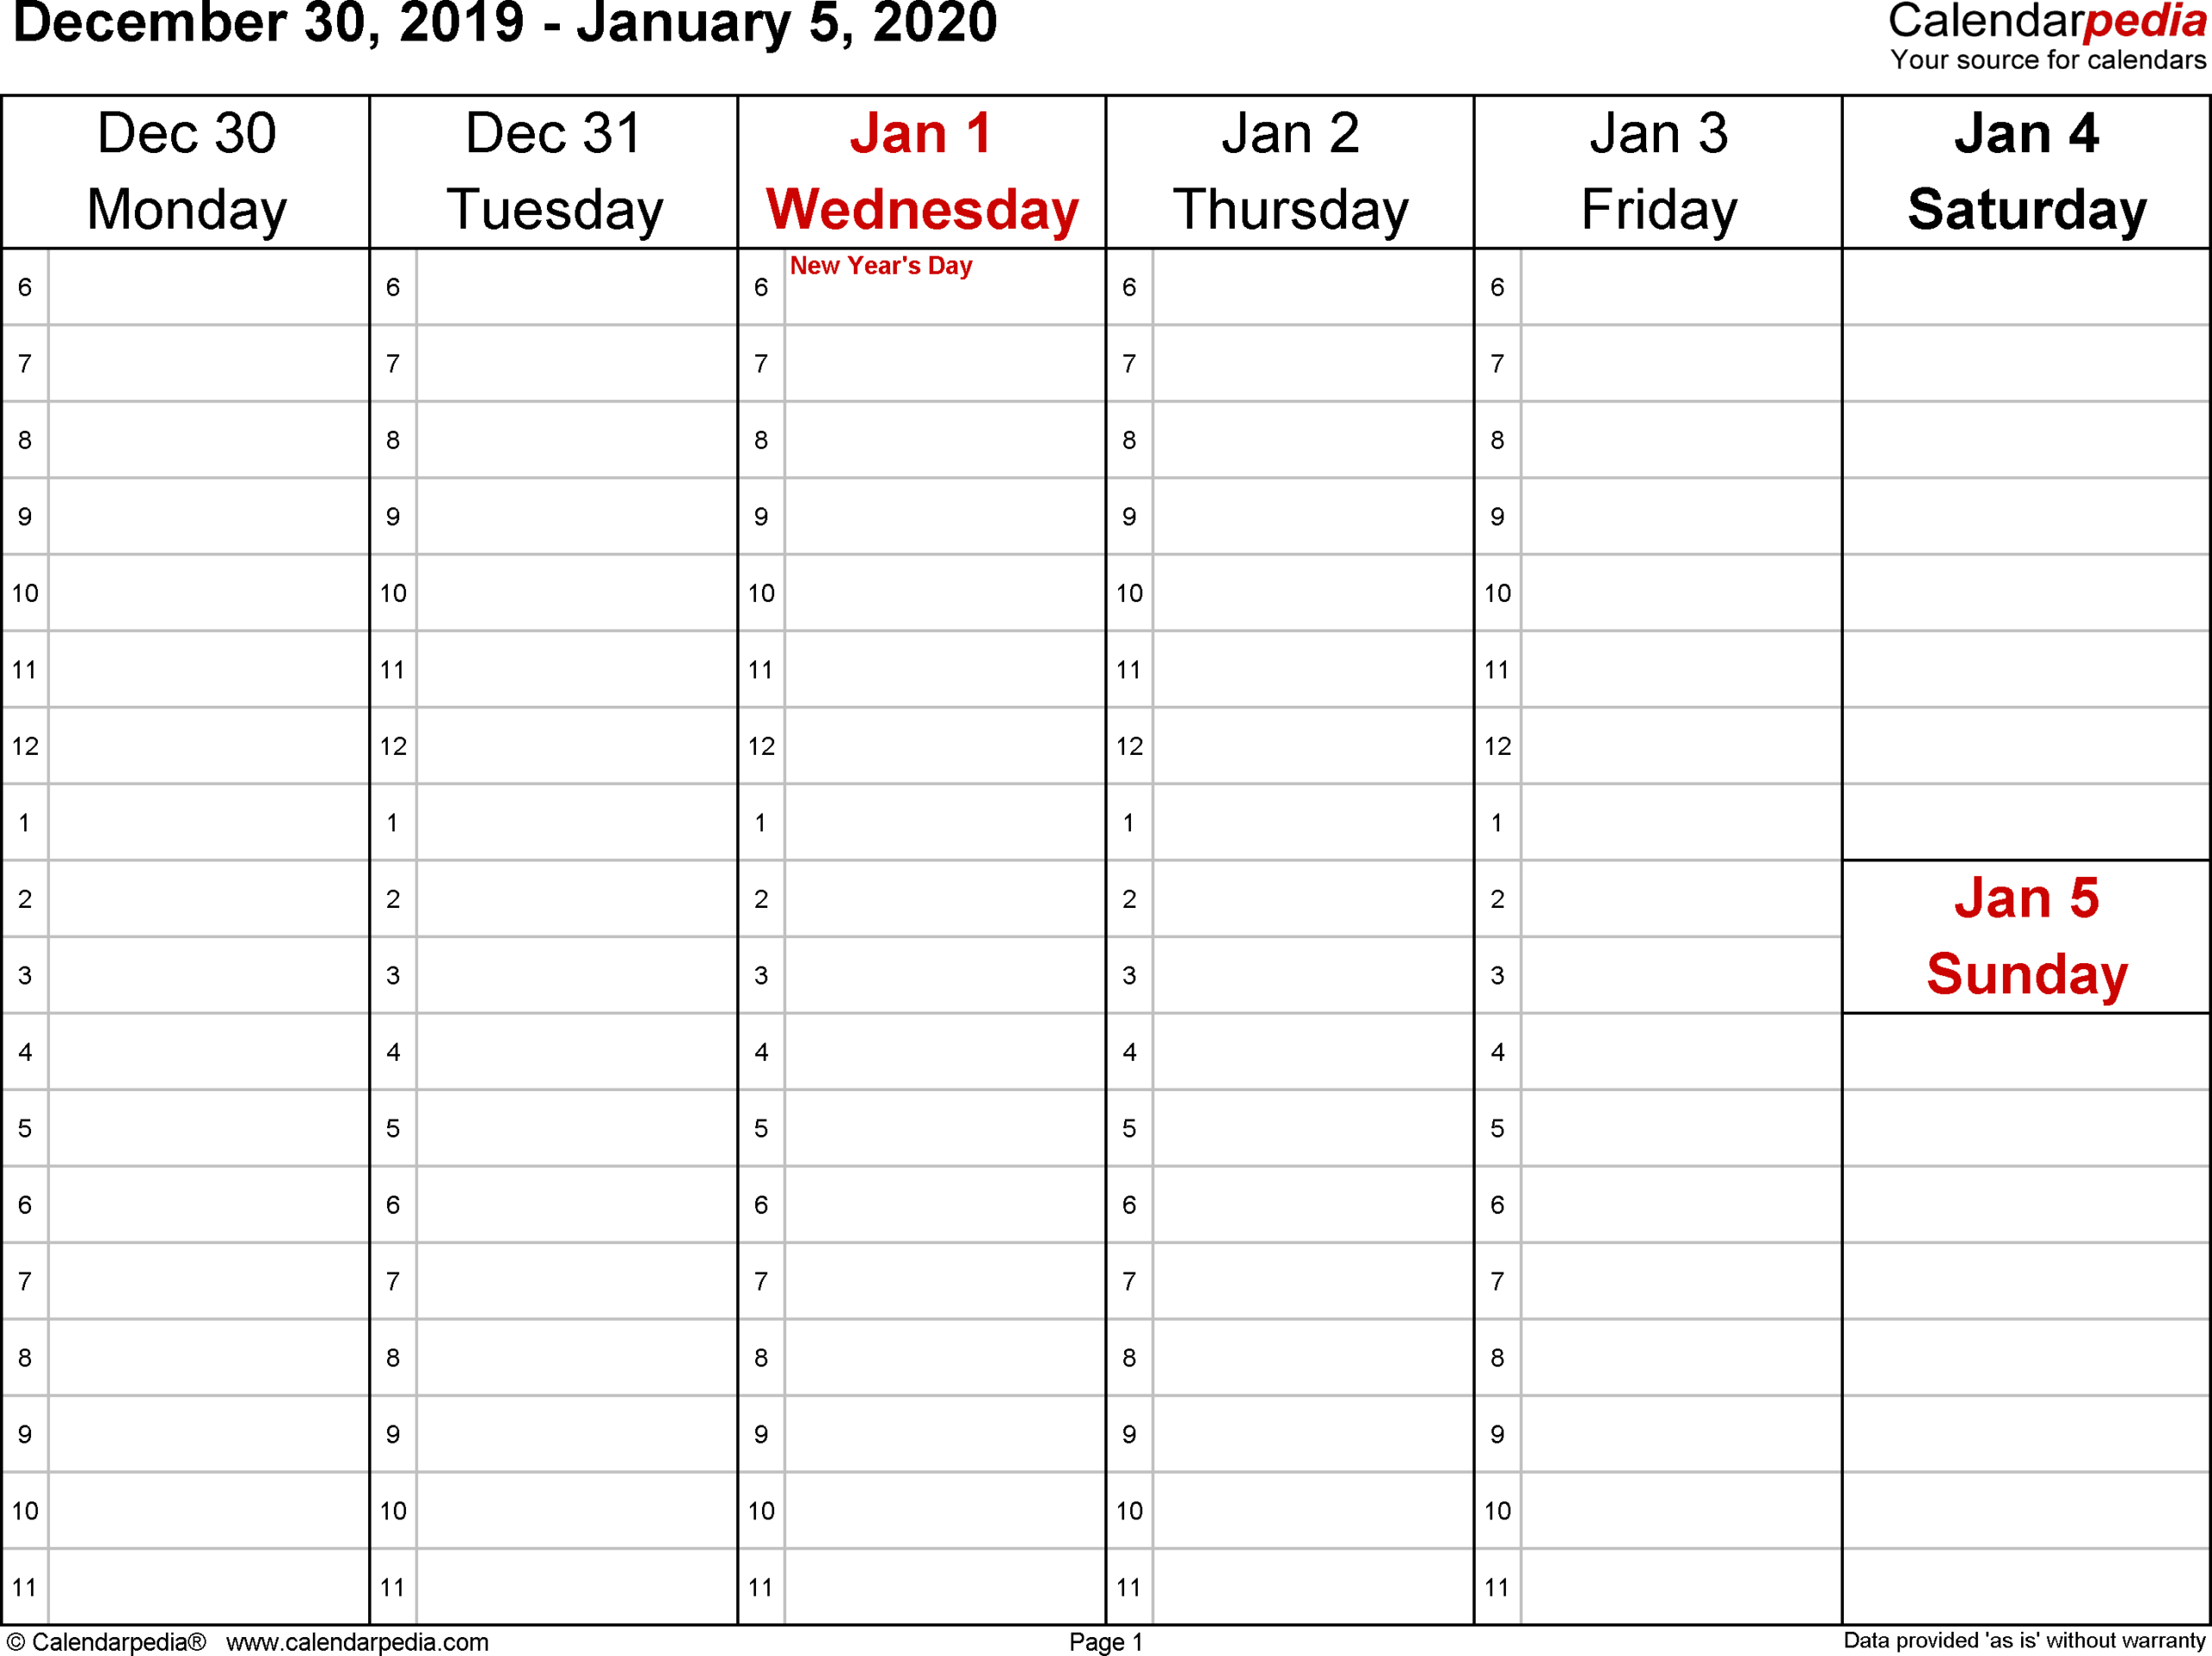 Free Printable W9 Form 2020 | Example Calendar Printable